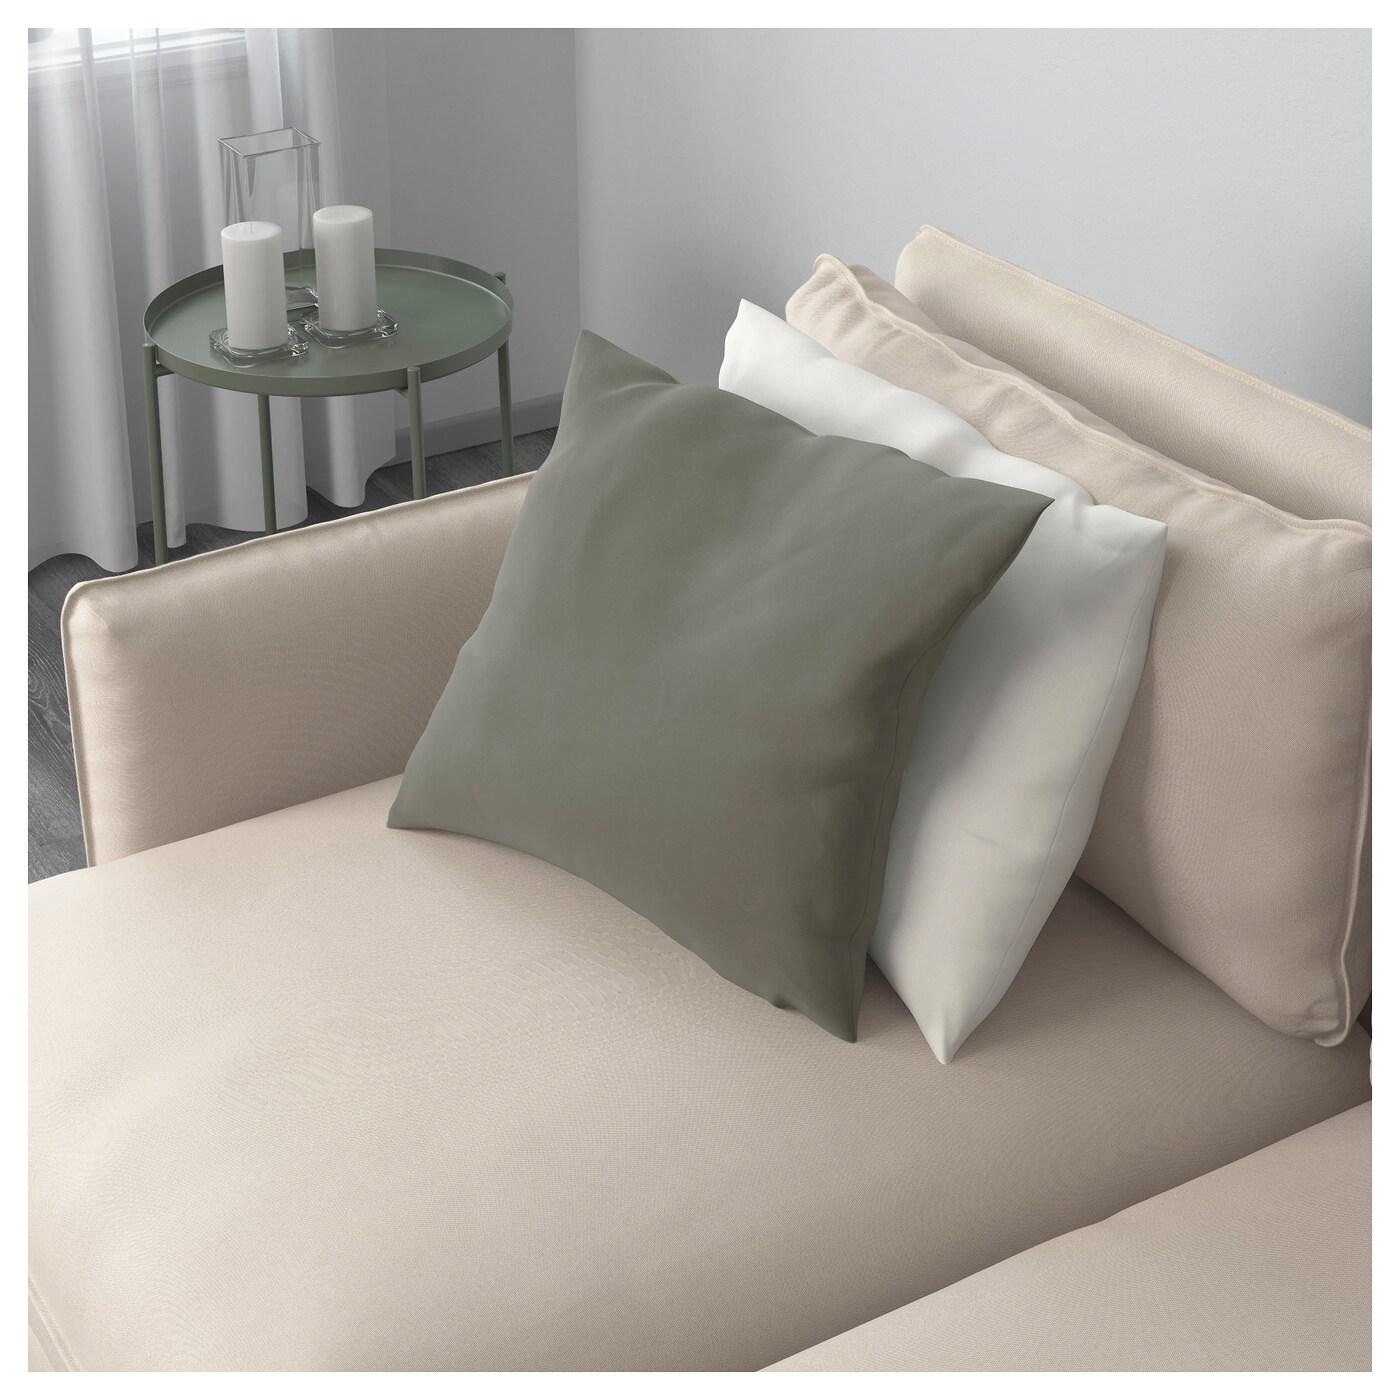 VALLENTUNA 4 seat sofa with bed Ramna dark beige IKEA